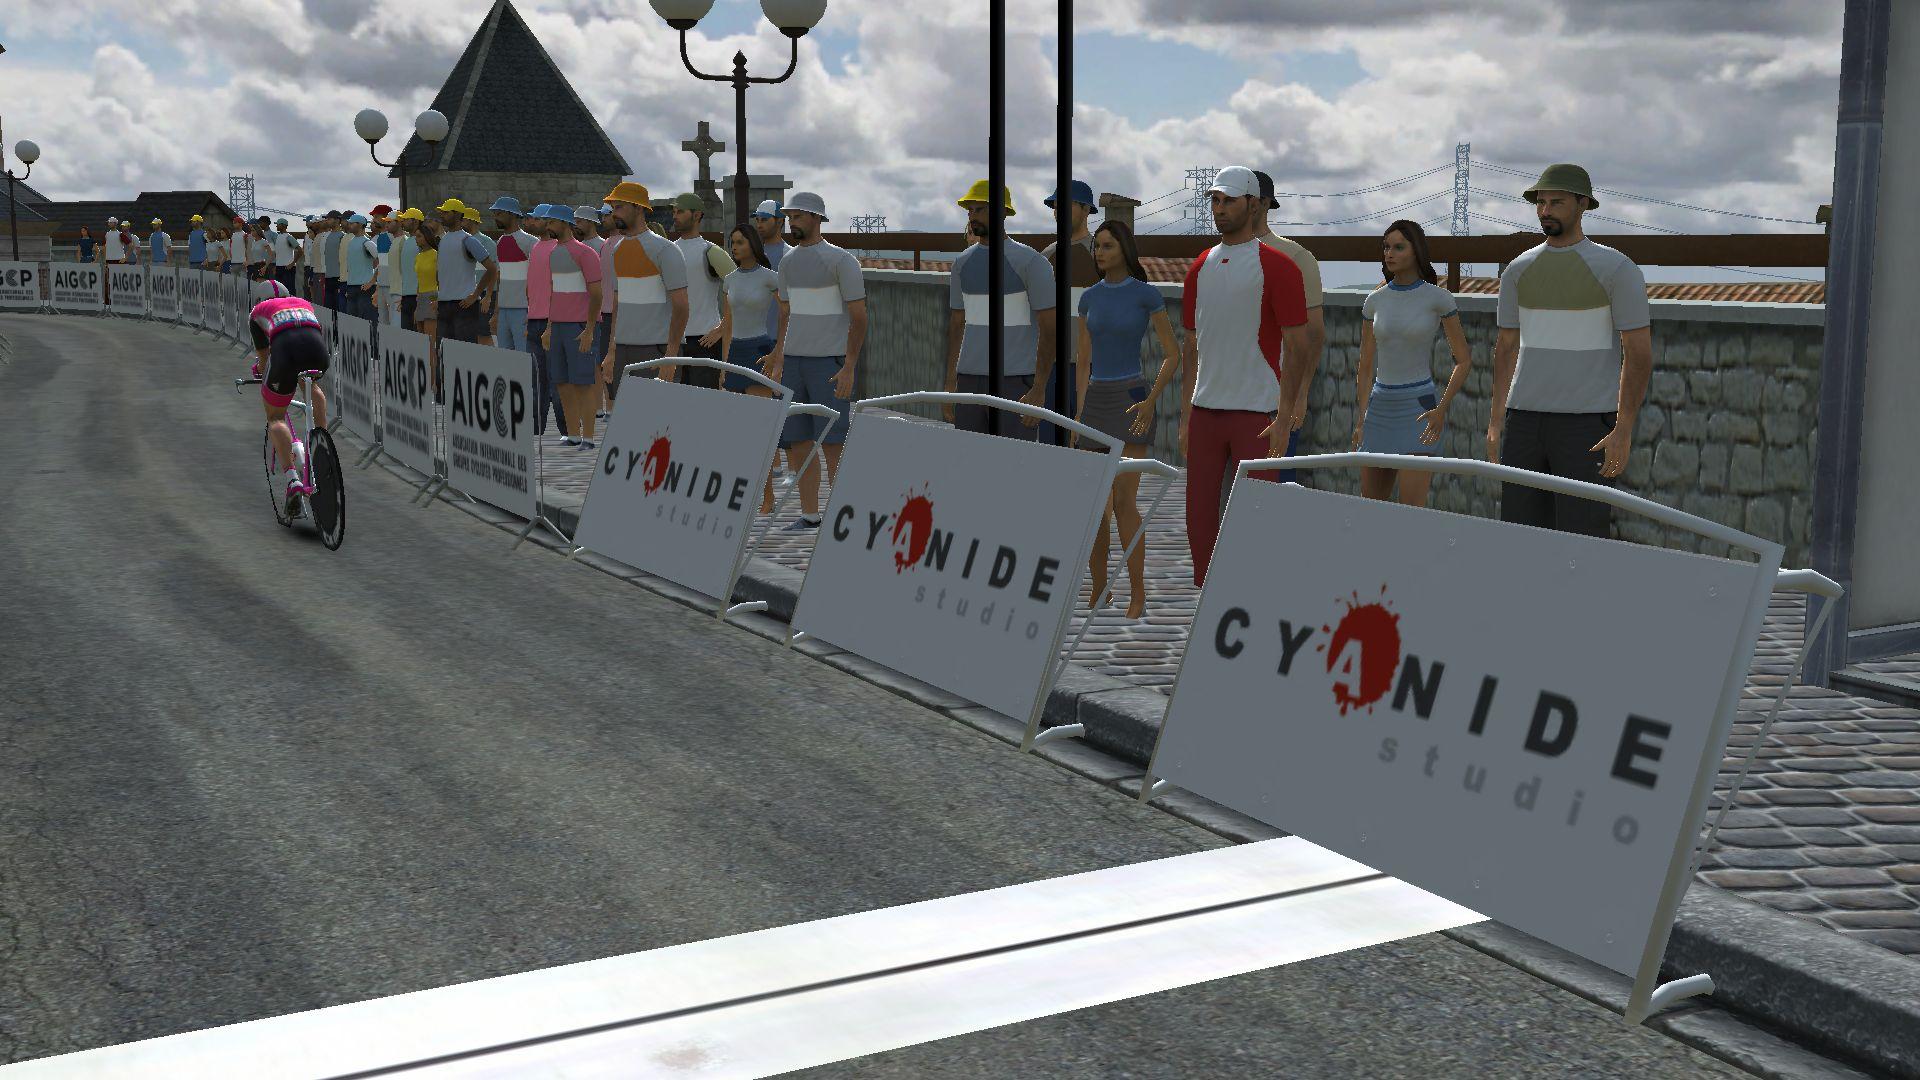 pcmdaily.com/images/mg/2019/Races/GTM/Giro/mg19_giro_09_PCM0060.jpg